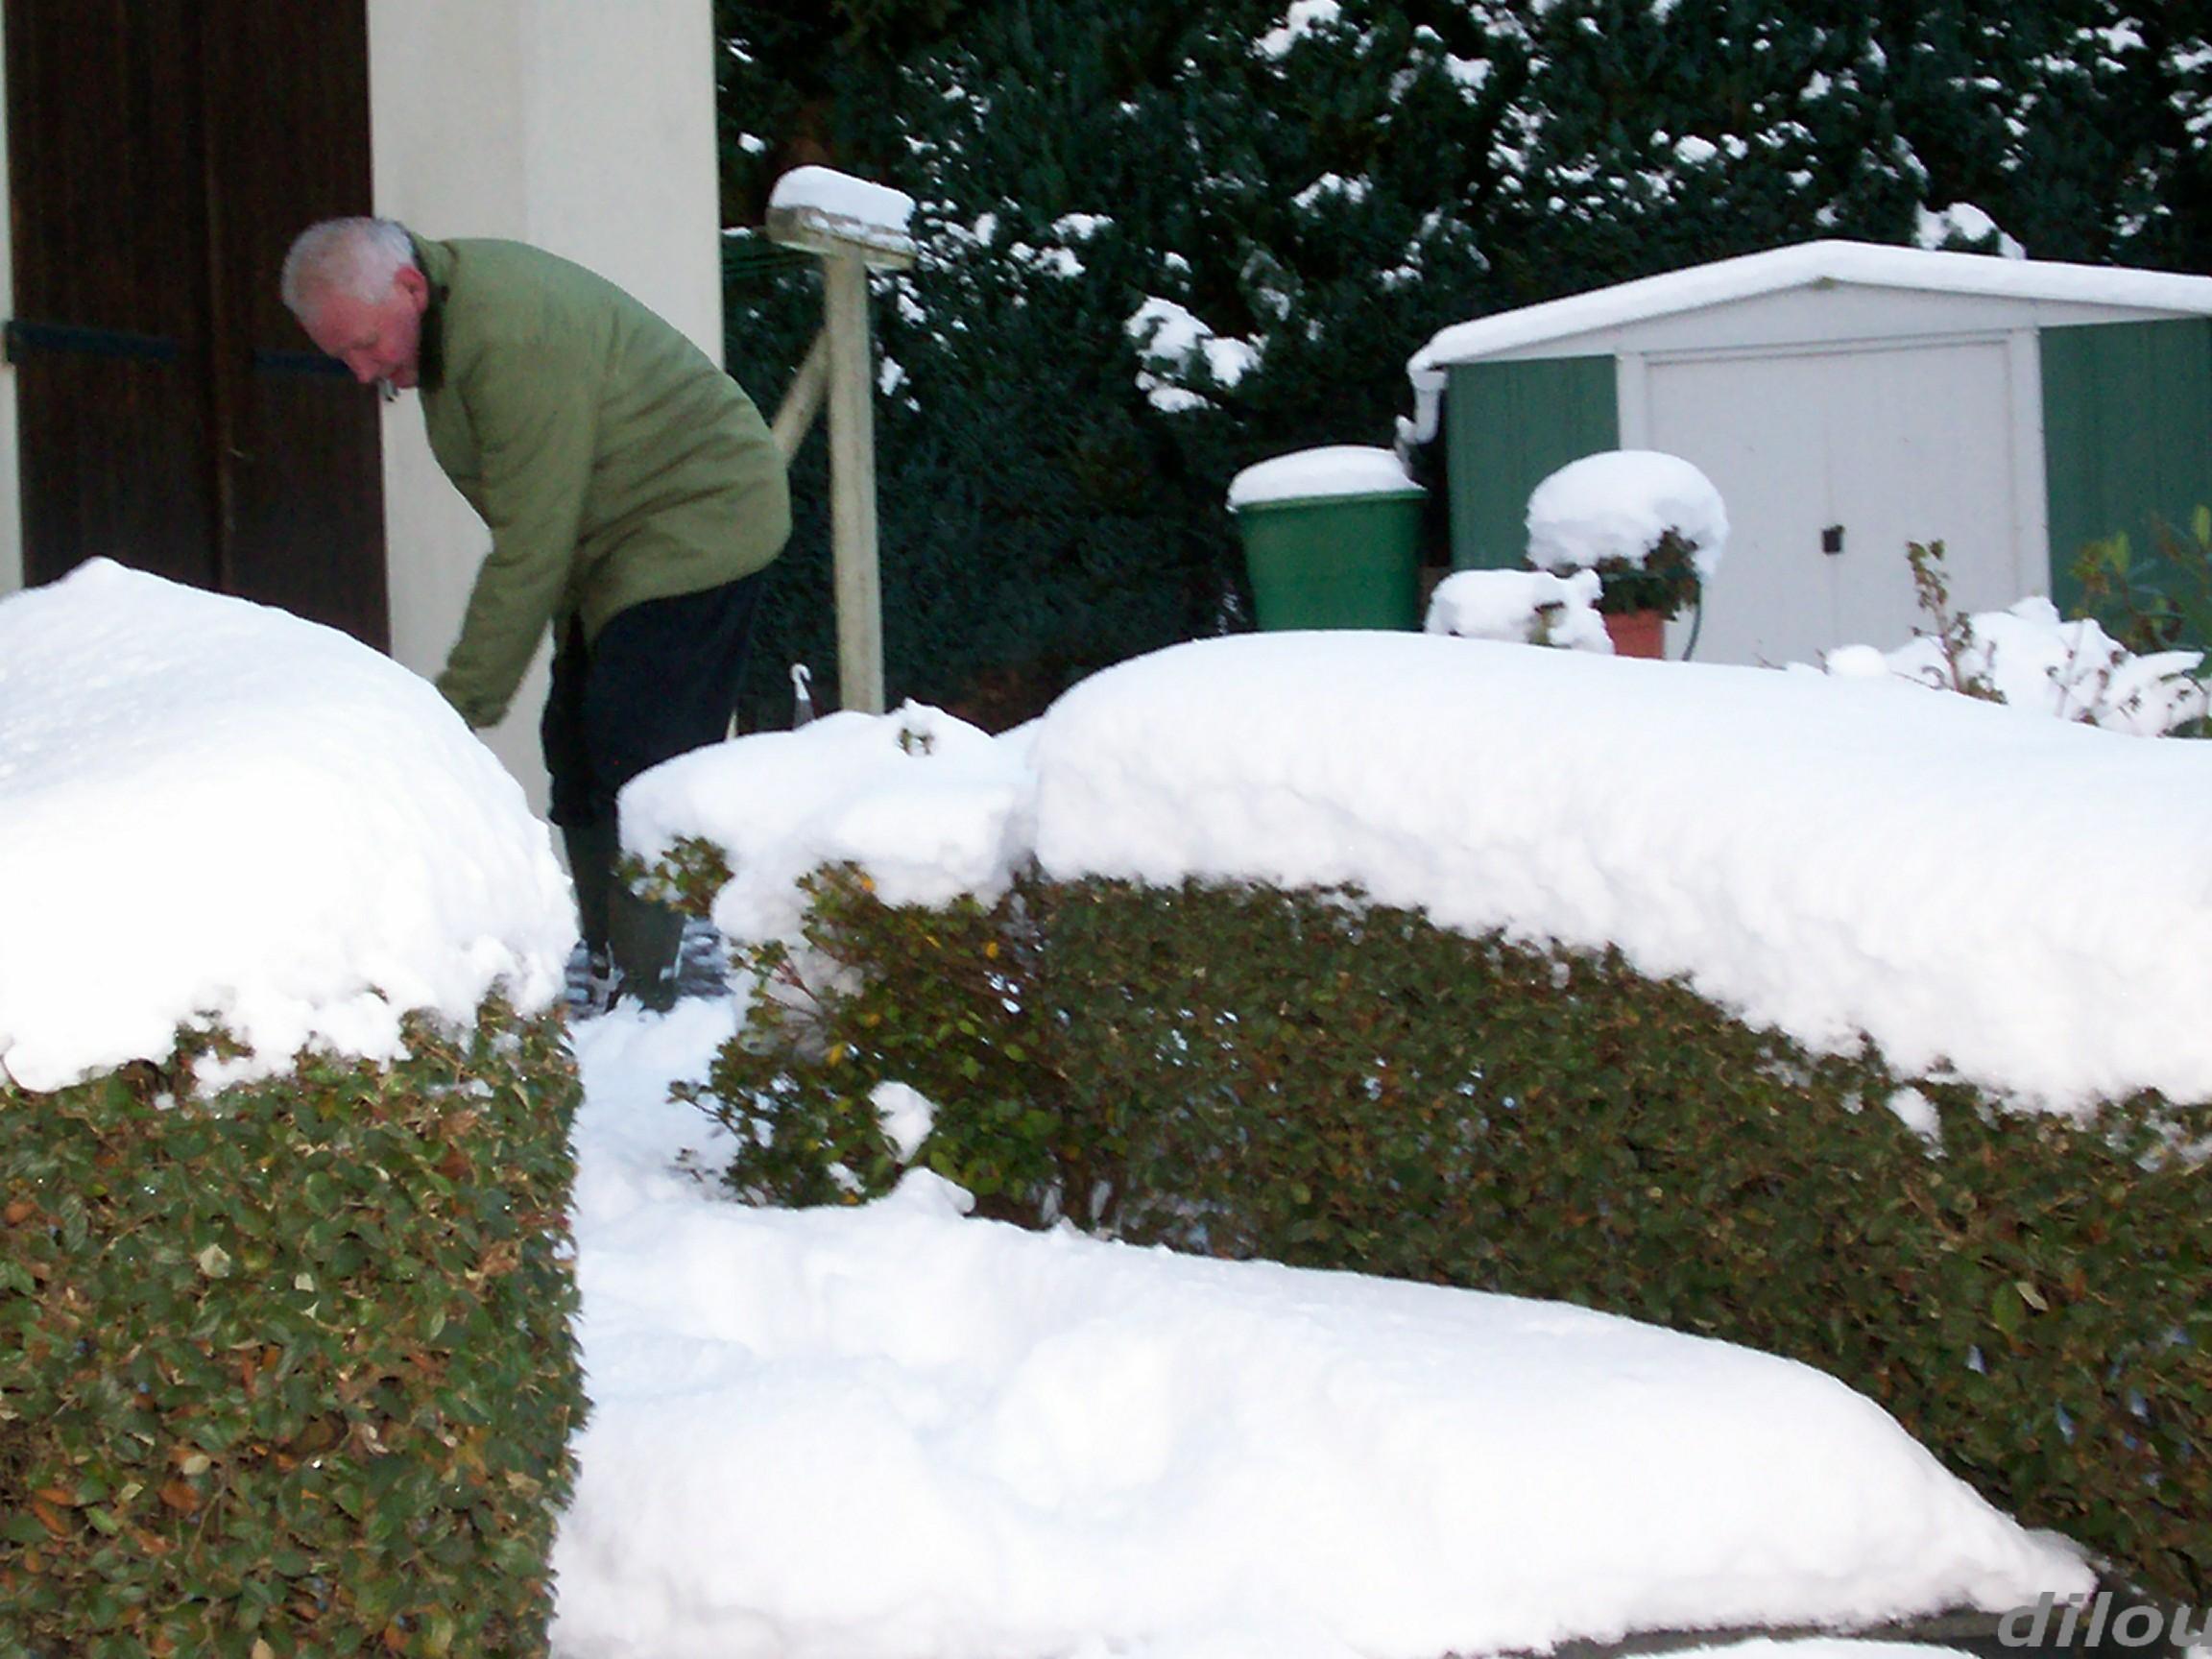 Quand la neige est la il faut deblayer devant la porte - Quand faut il tailler la vigne ...